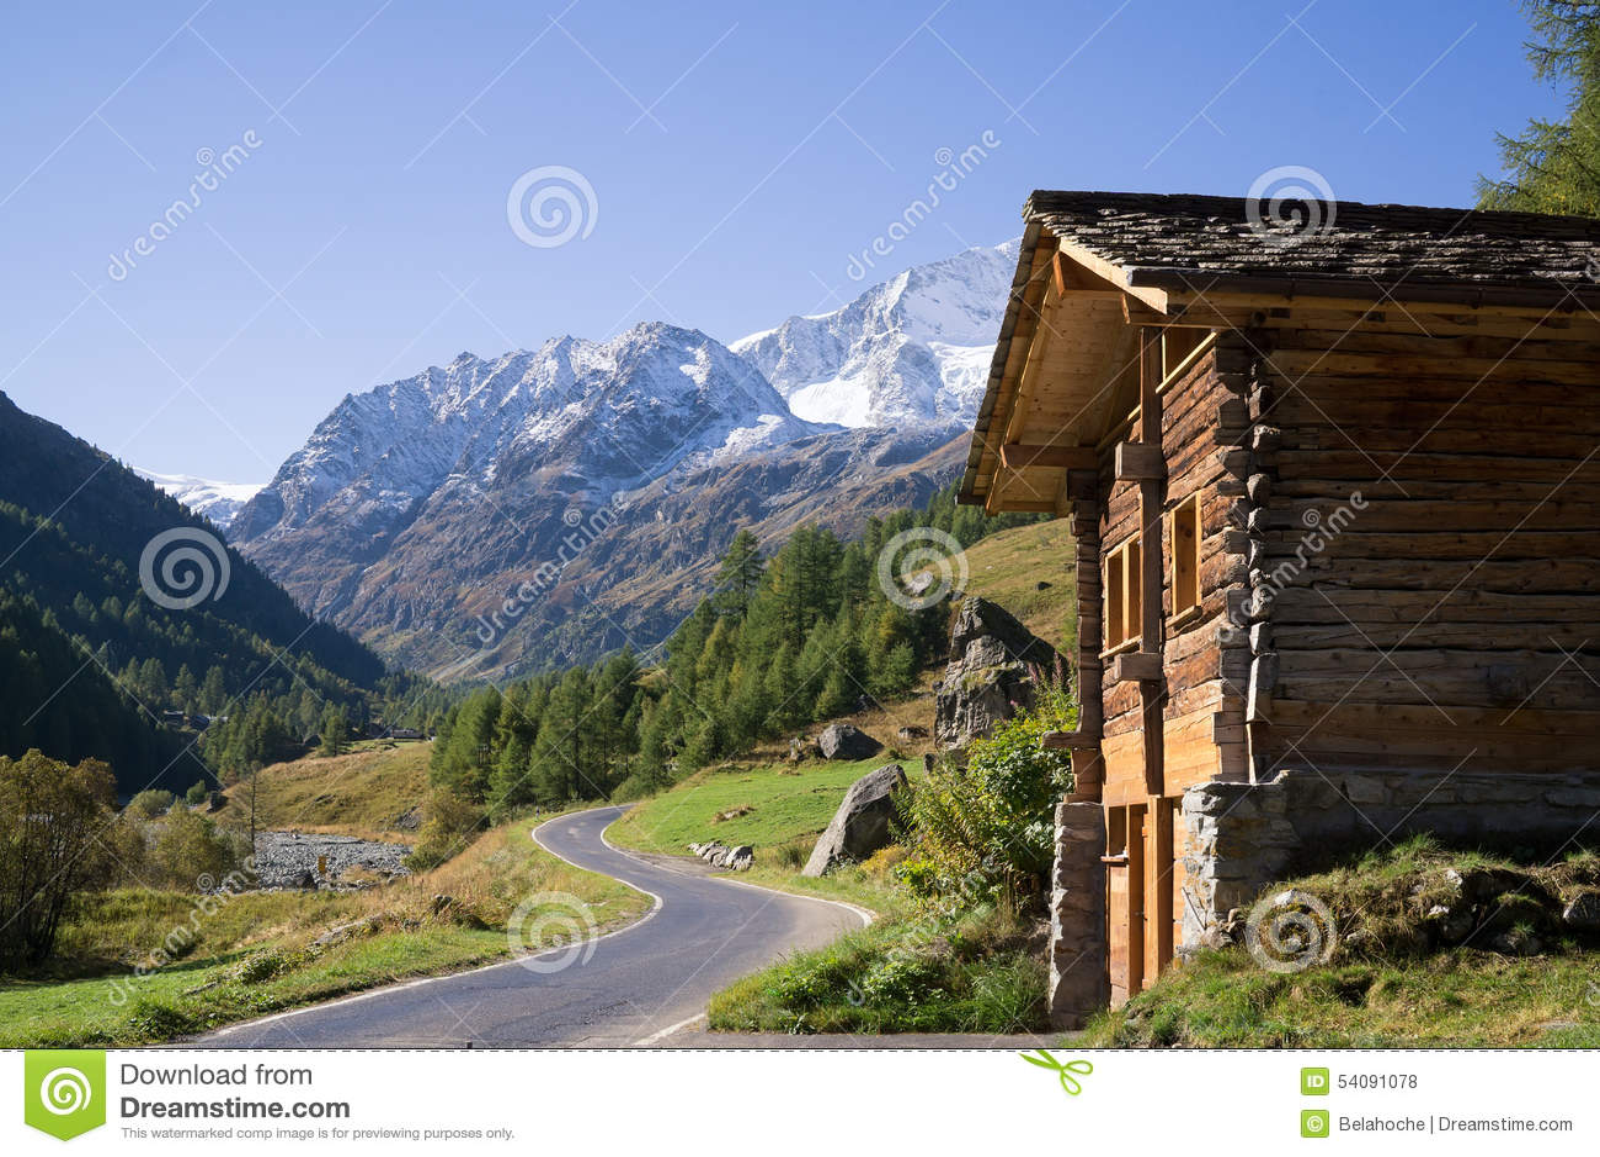 Houten Cabine in Bergvallei